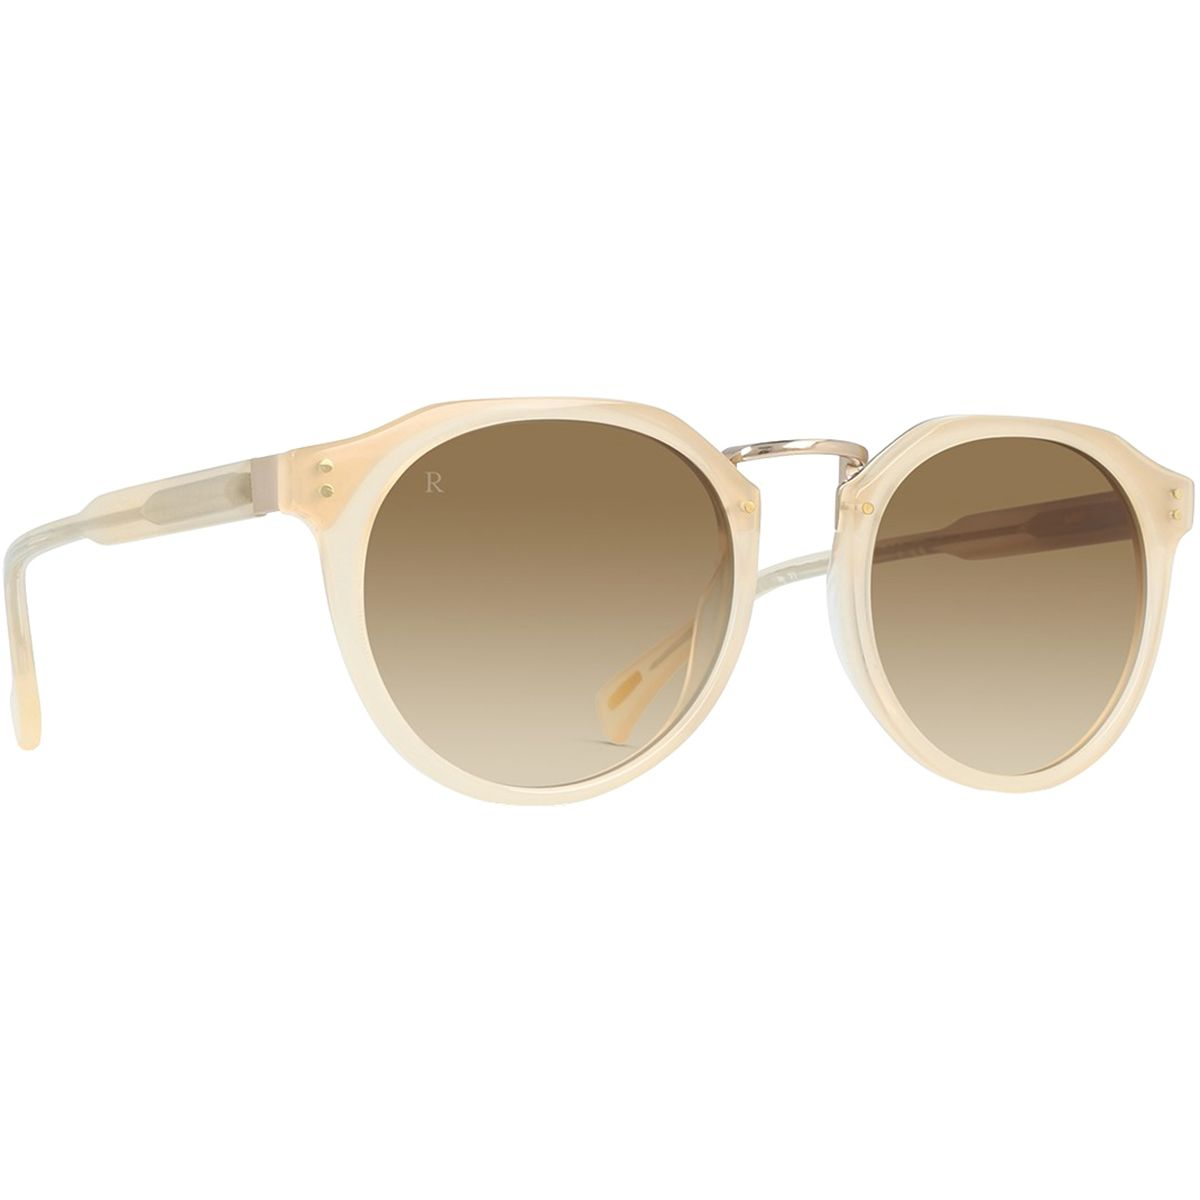 RAEN Remmy Alchemy Plum Wine Bronze Mirror Size 52 New In Box Sunglasses